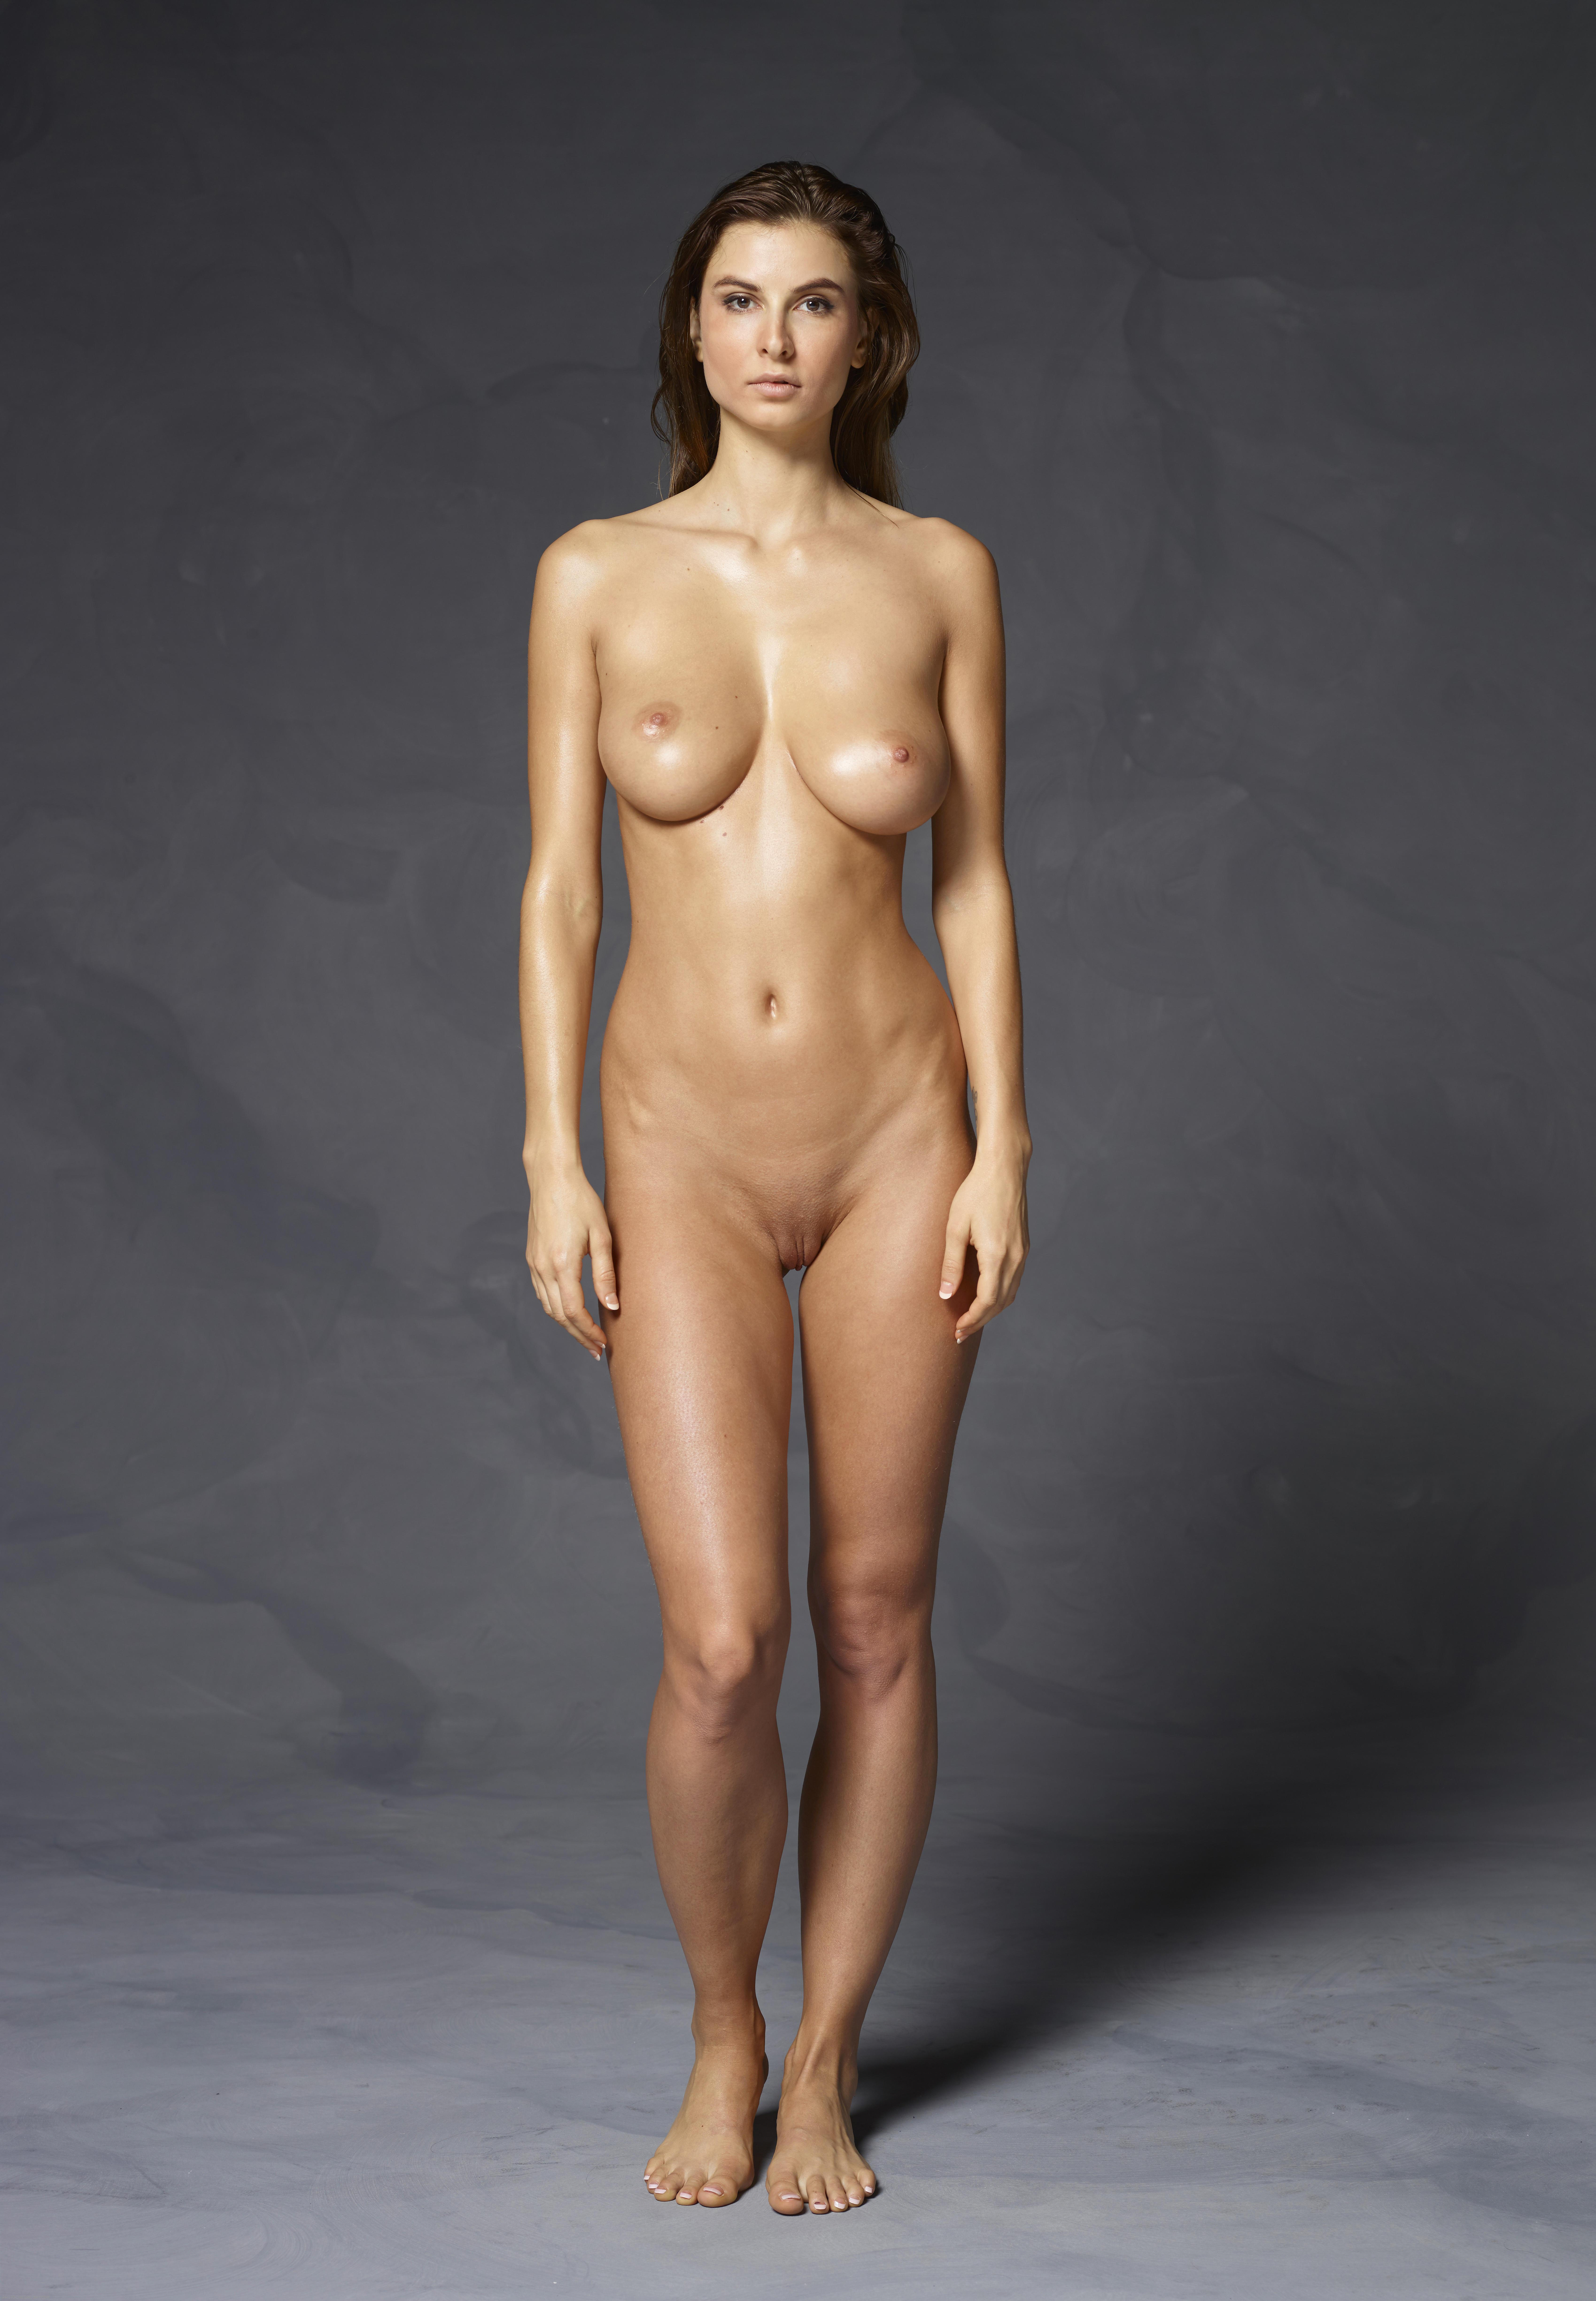 Fully naked girl bodies, opowiadania porno